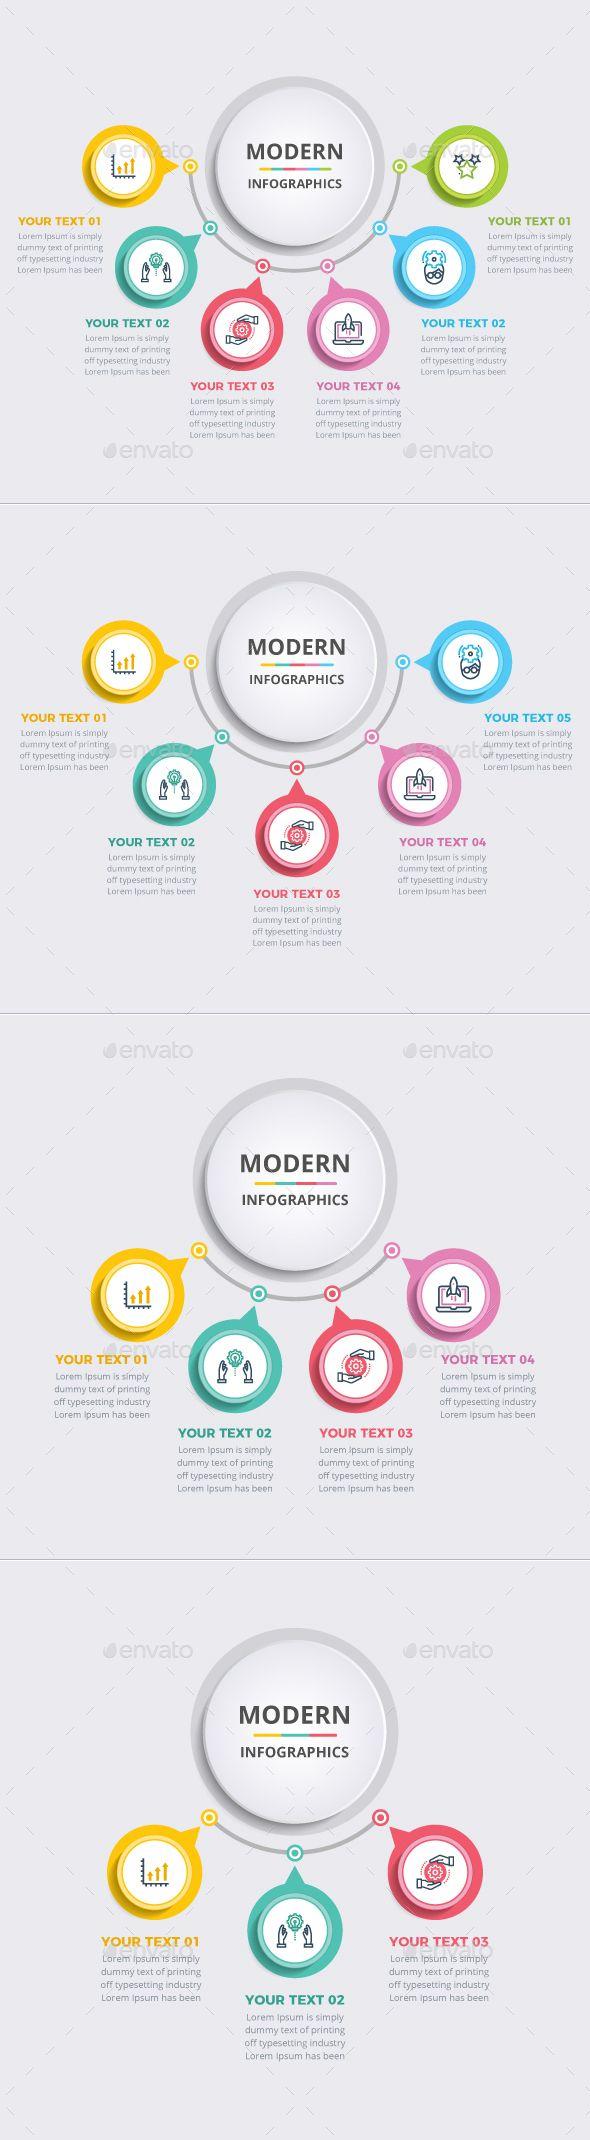 Simple Modern Circle Infographics Template Vector EPS, AI Illustrator